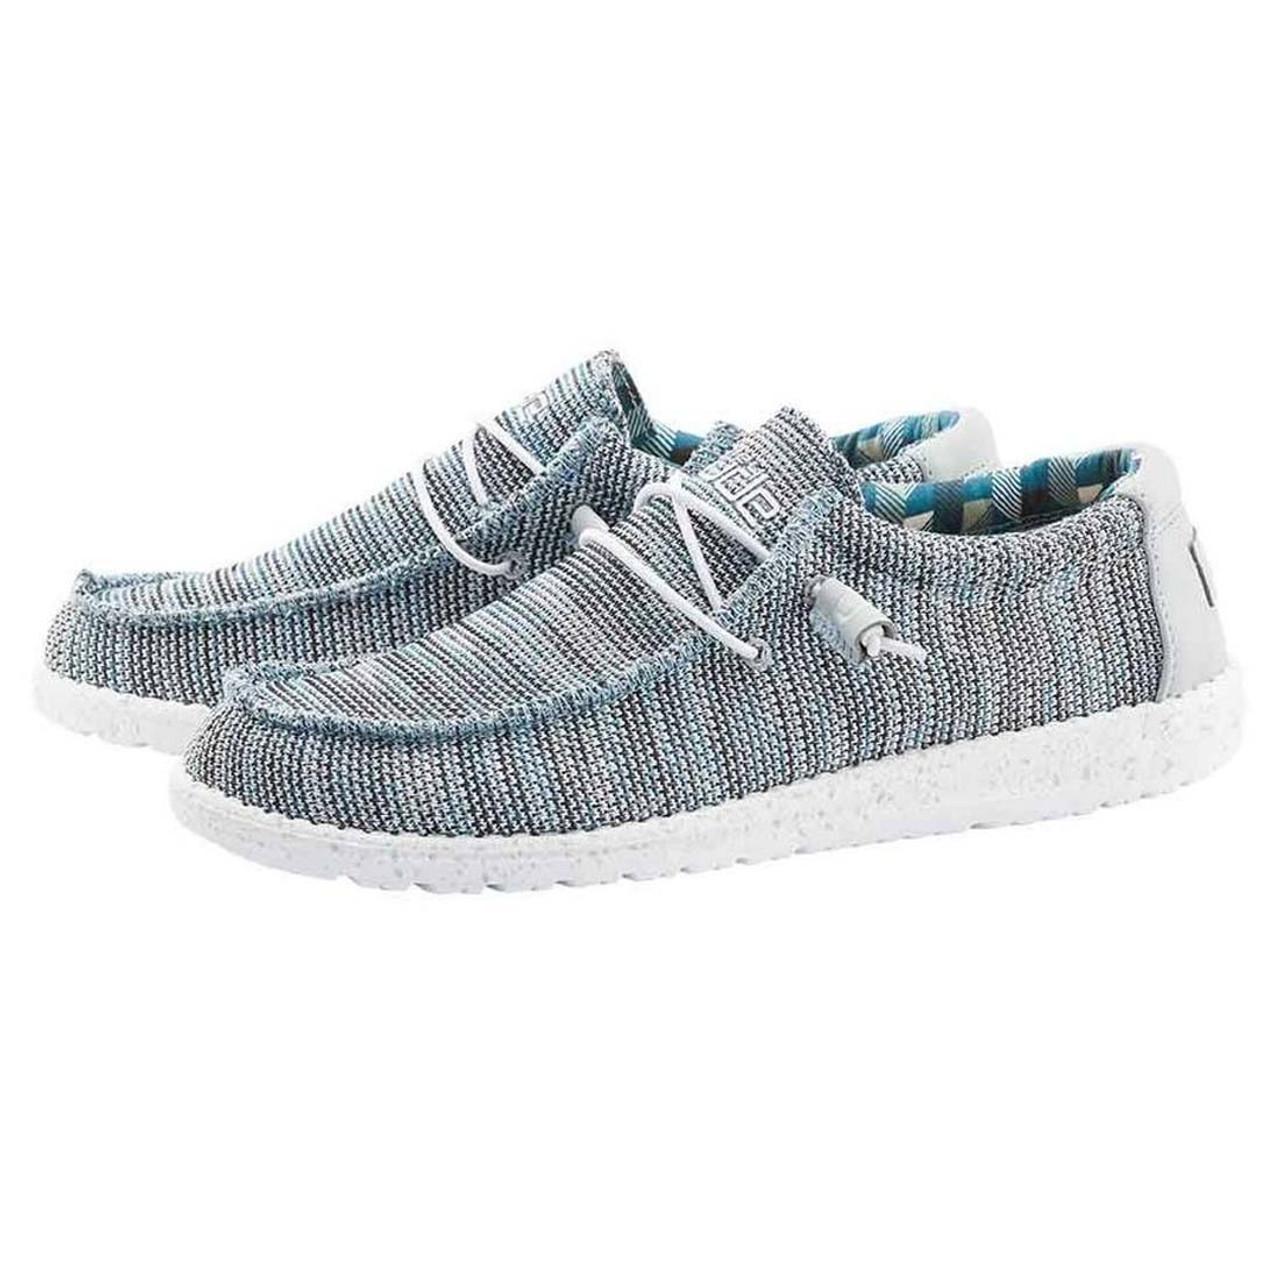 Wally Sox Funk Shoes - Ice Grey